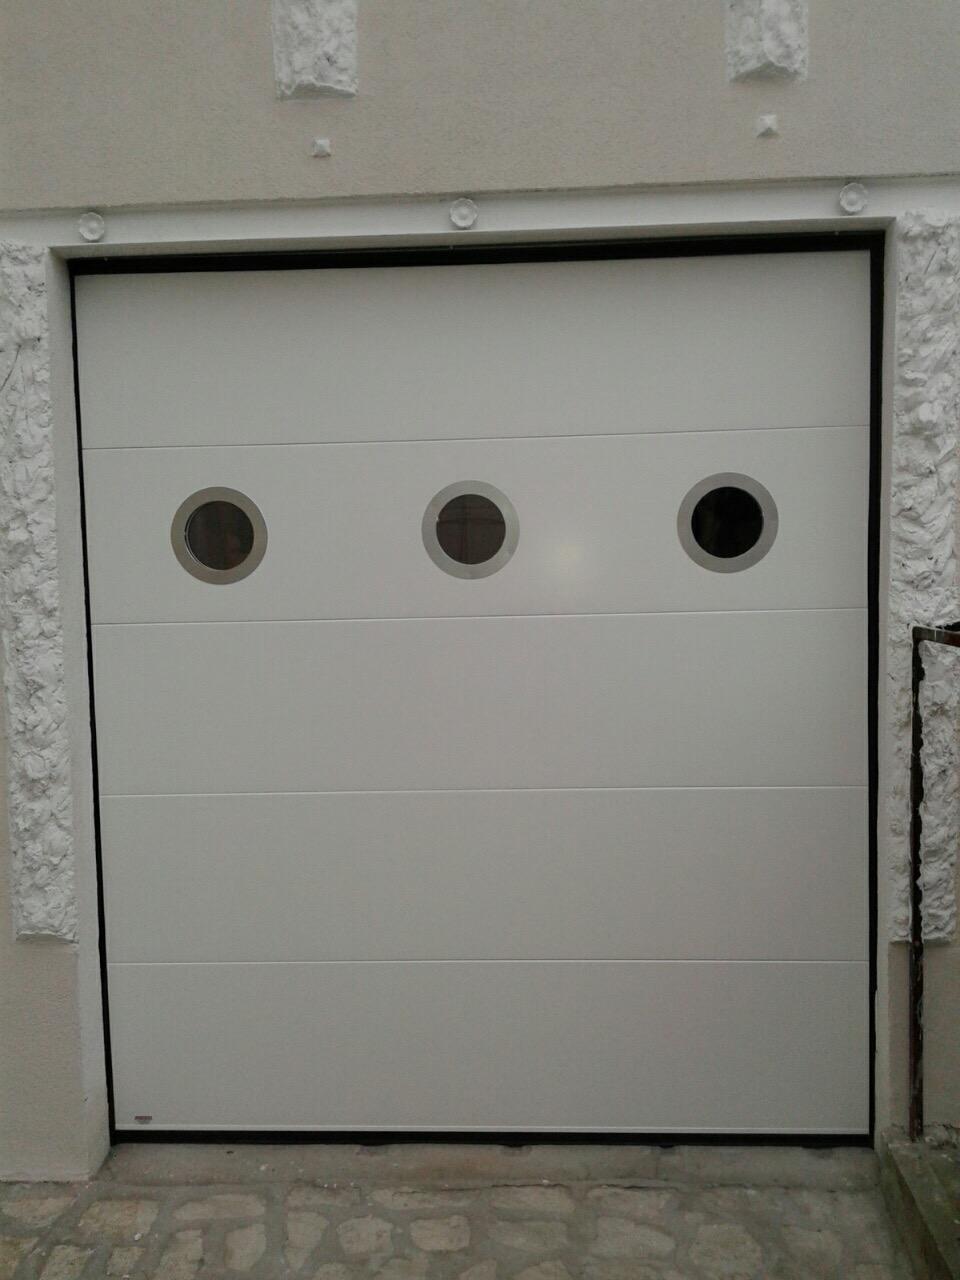 Porte residentielle lisse 9016 avec hublot alunox dim for Porte de garage sectionnelle lisse